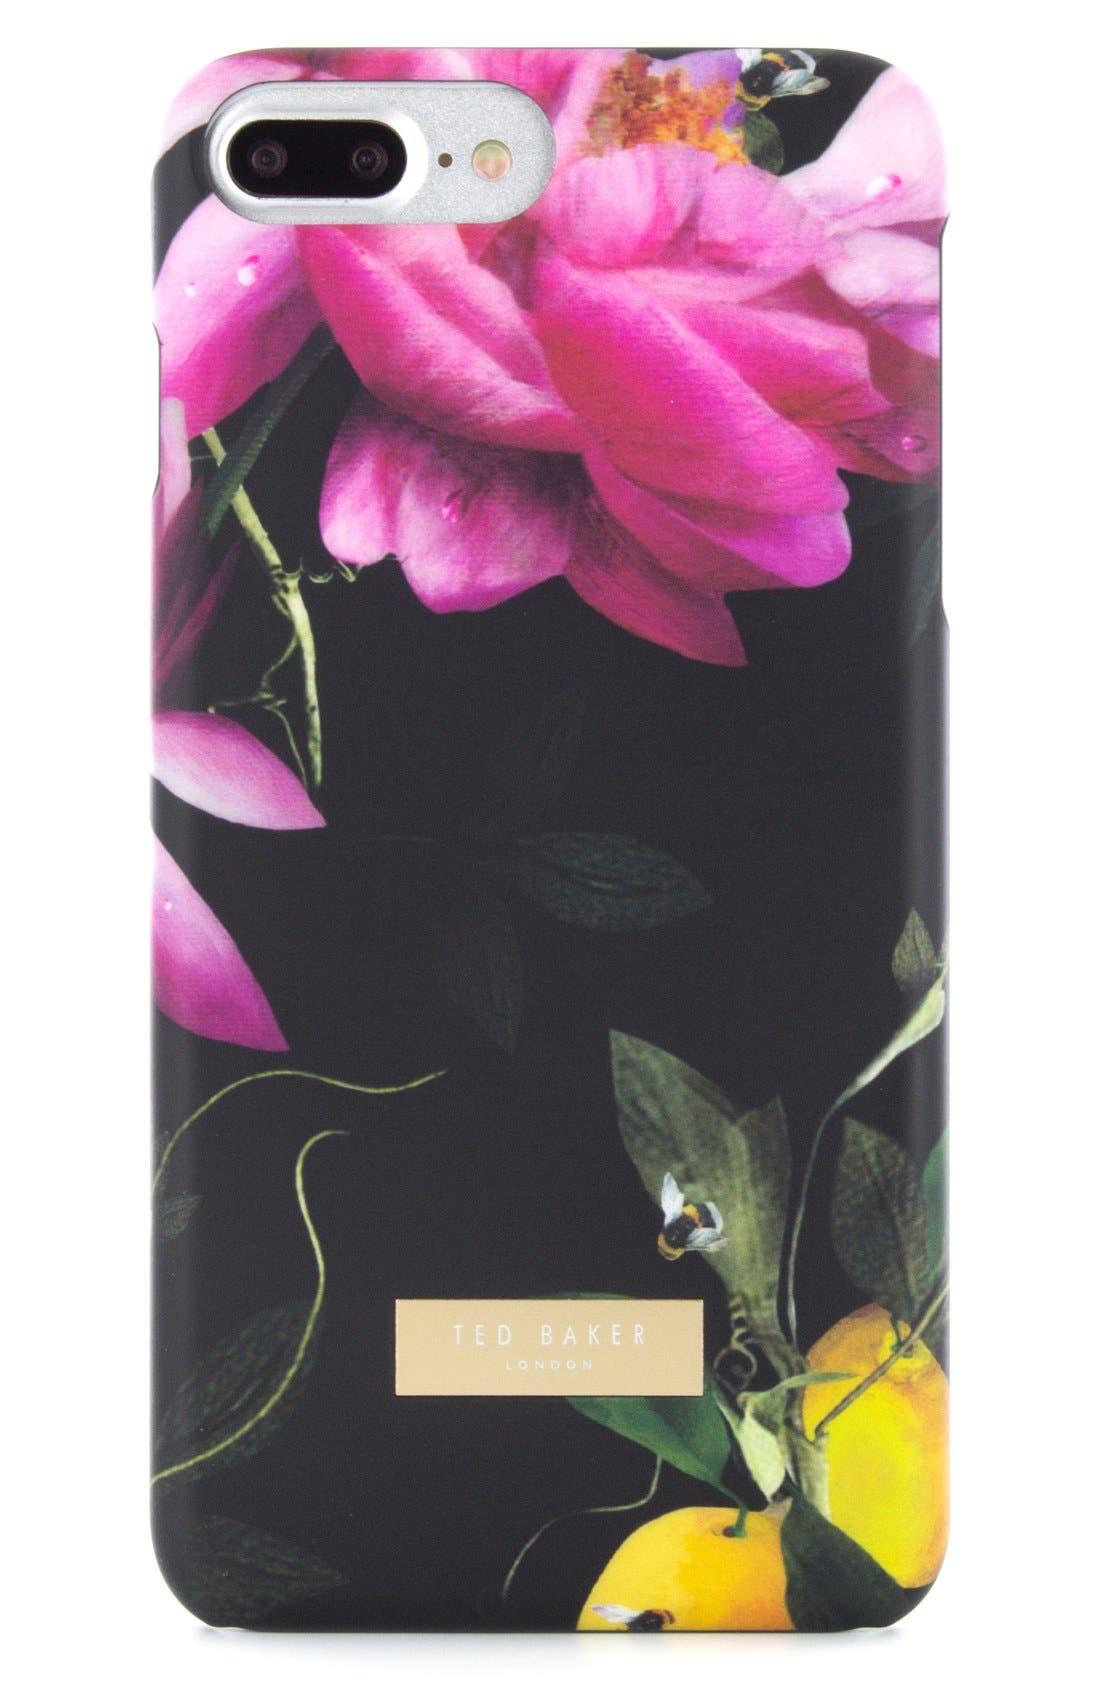 Alternate Image 1 Selected - Ted Baker London Citrus Bloom iPhone 6/6s/7/8 & 6/7/8 Plus Case